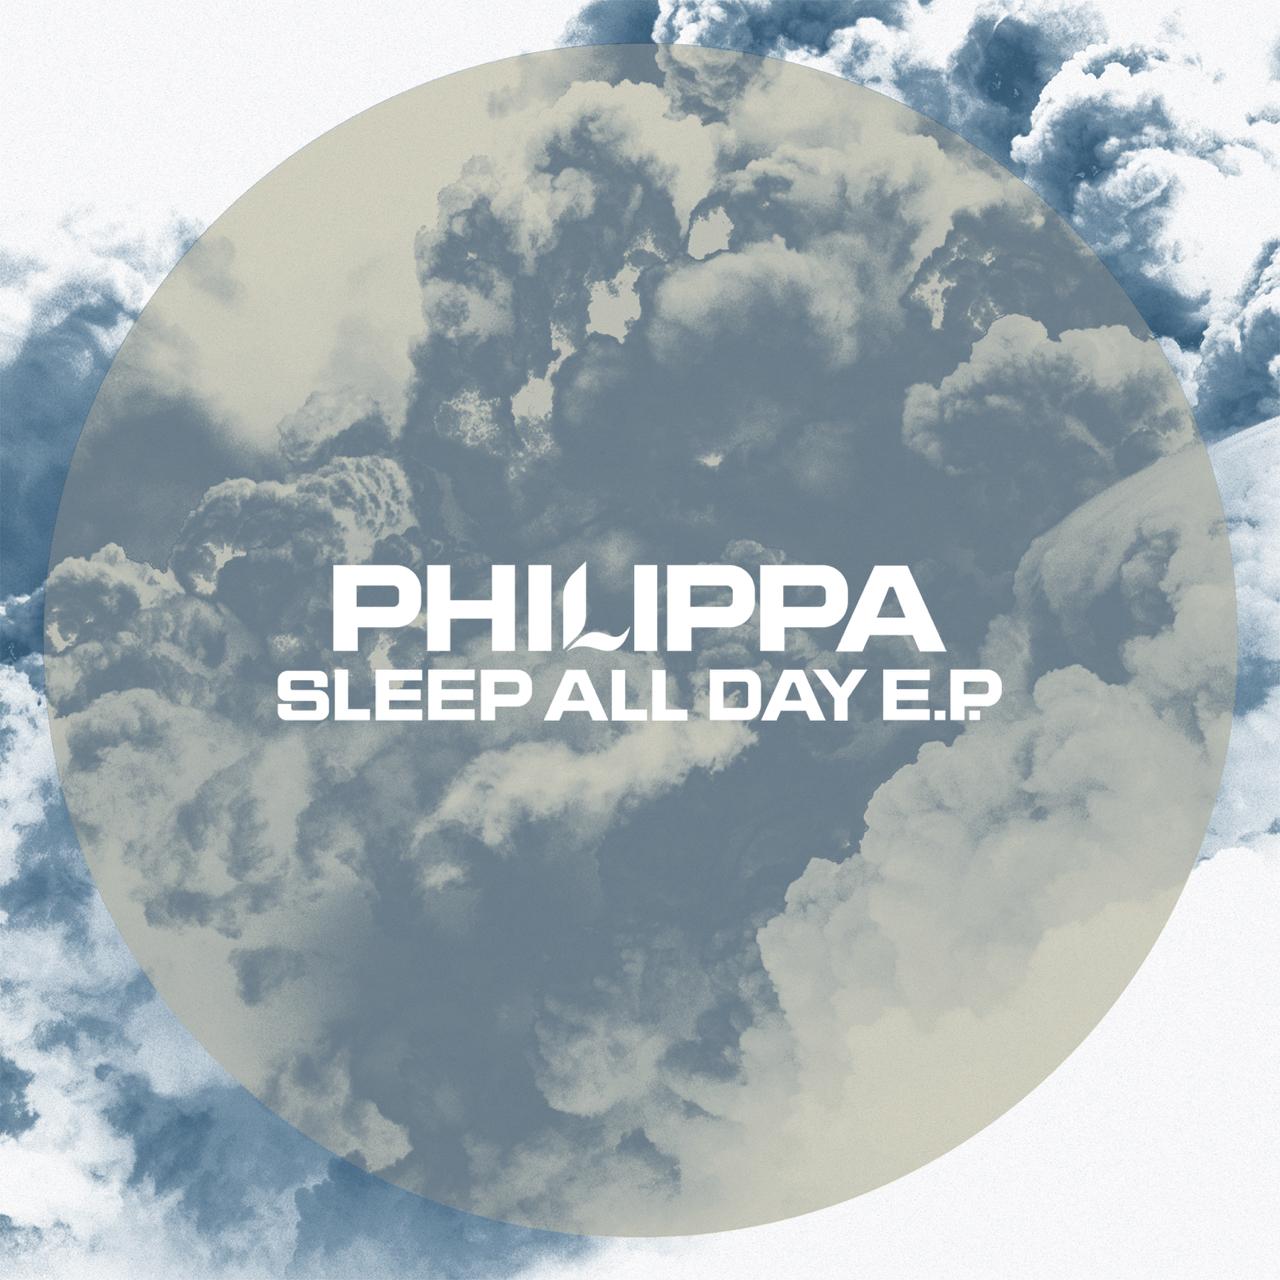 PHILIPPA Sleep All Day e.p.